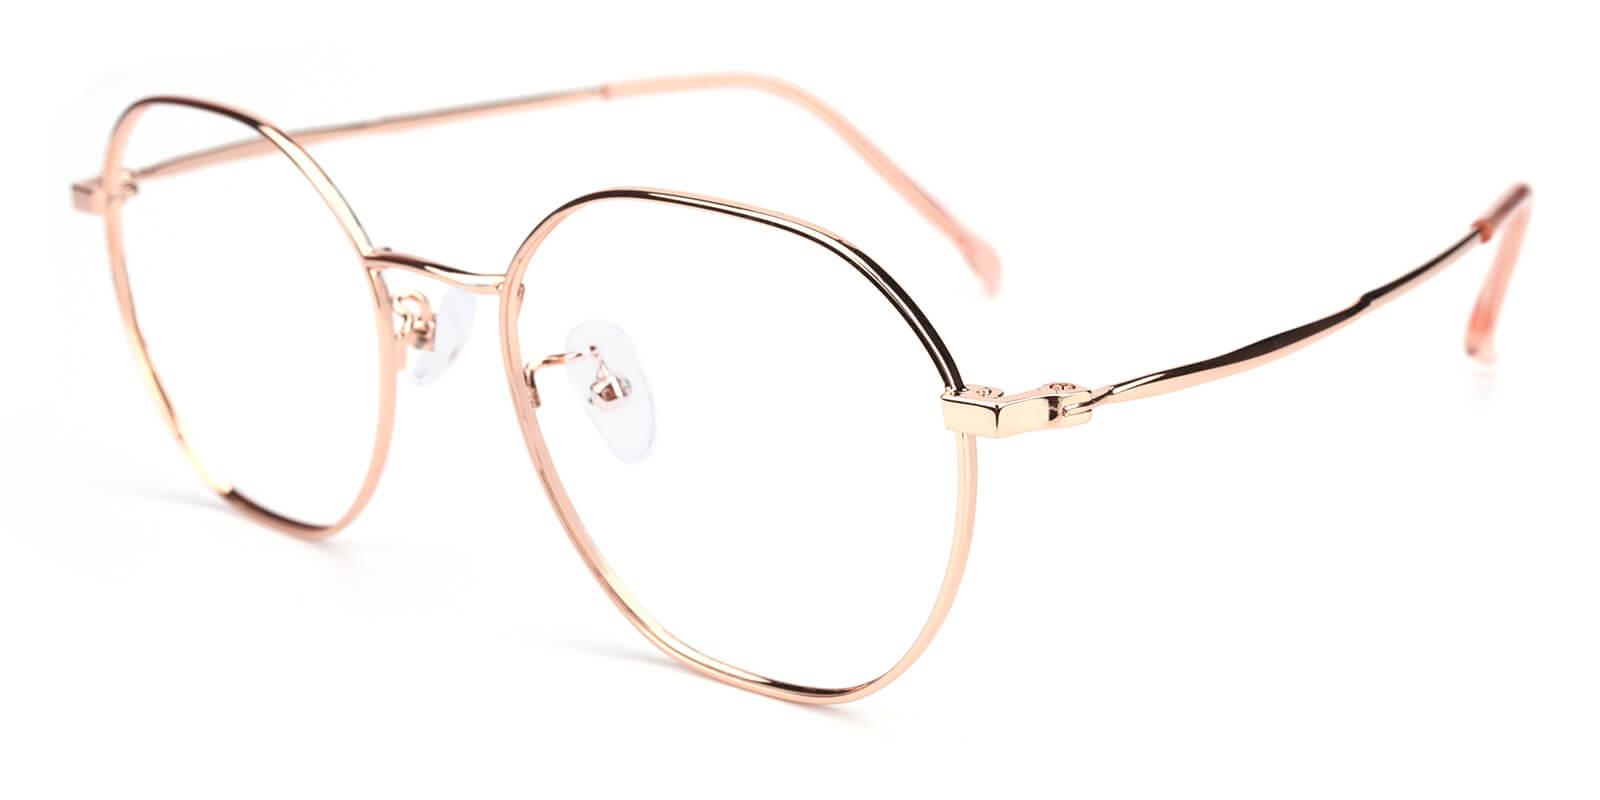 Govind-Pink-Round-Metal-Eyeglasses-additional1